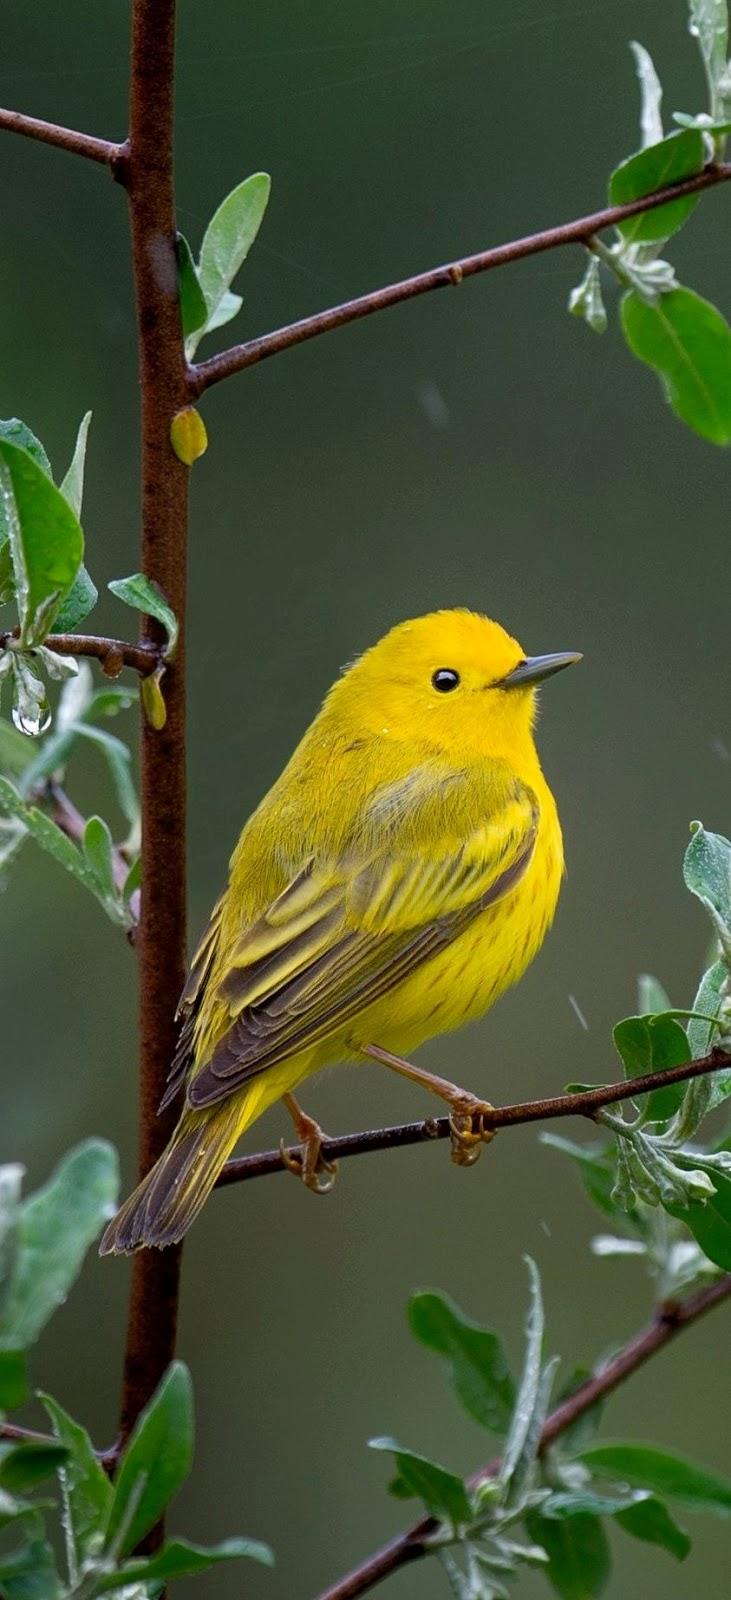 Beautiful yellow warbler bird.